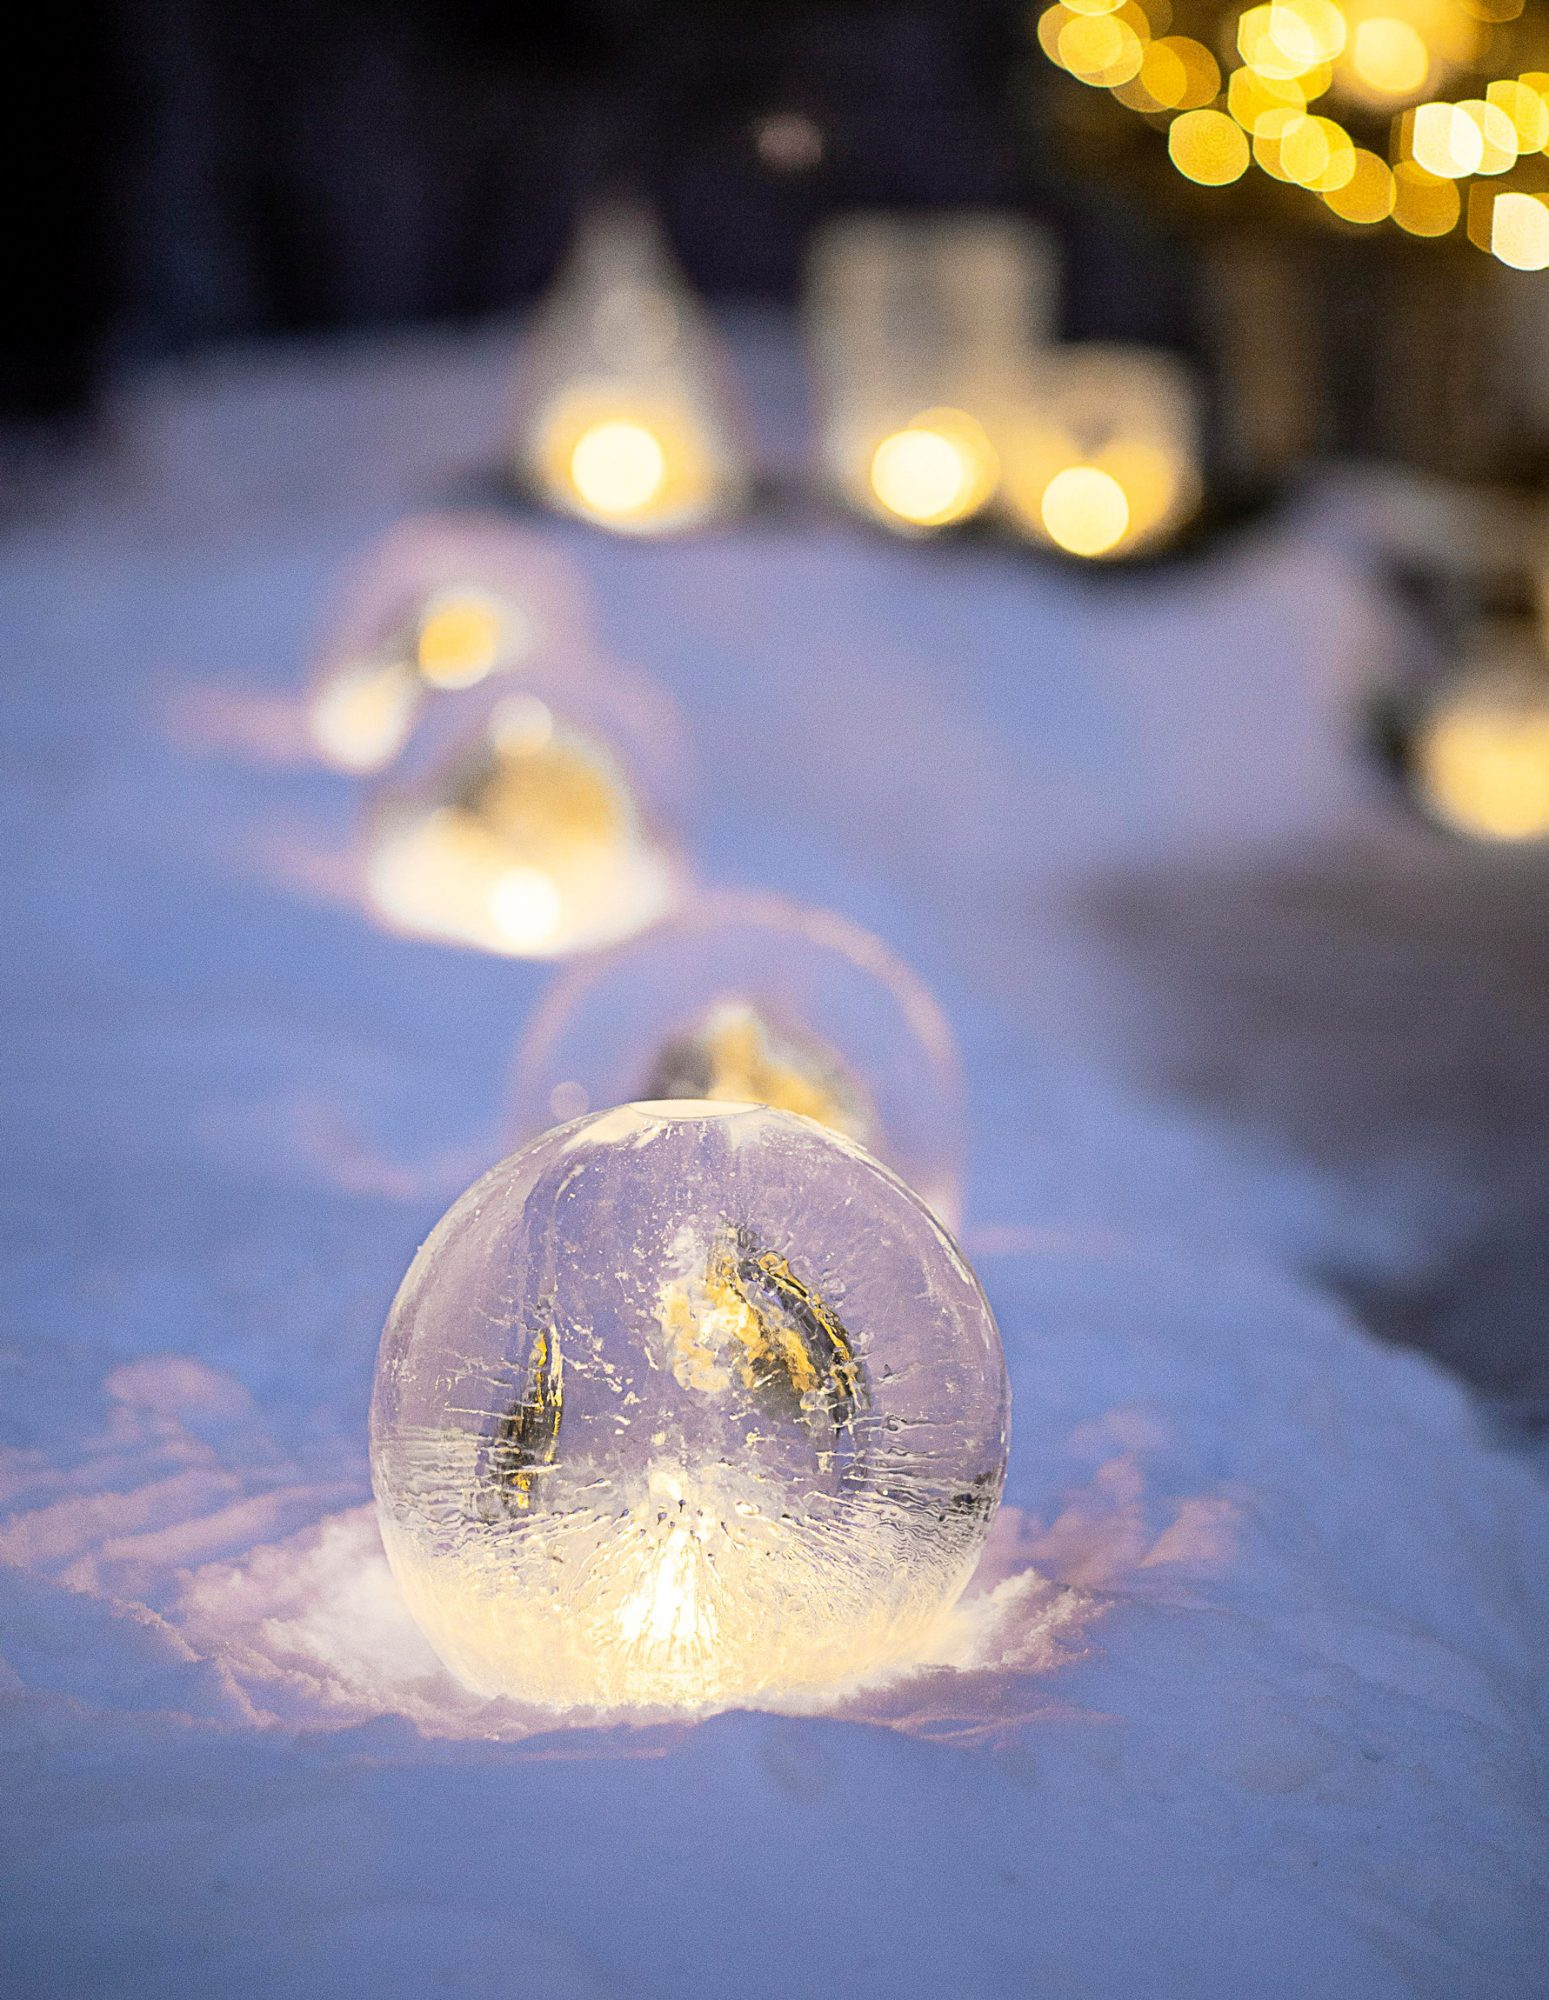 Ice luminaria